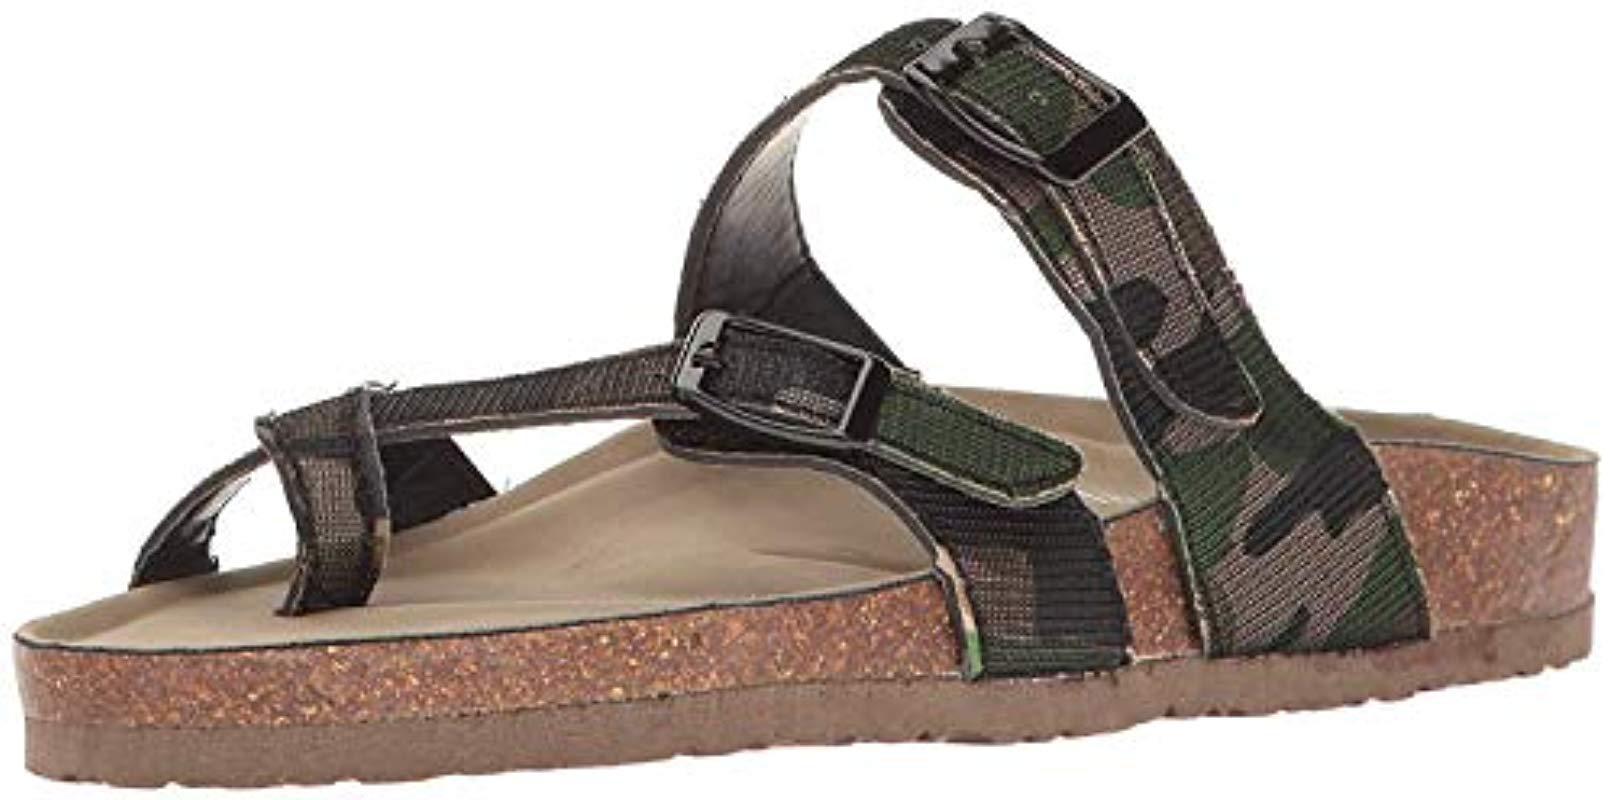 283dc1b4f4e Lyst - Madden Girl Bryceee Toe Ring Sandal